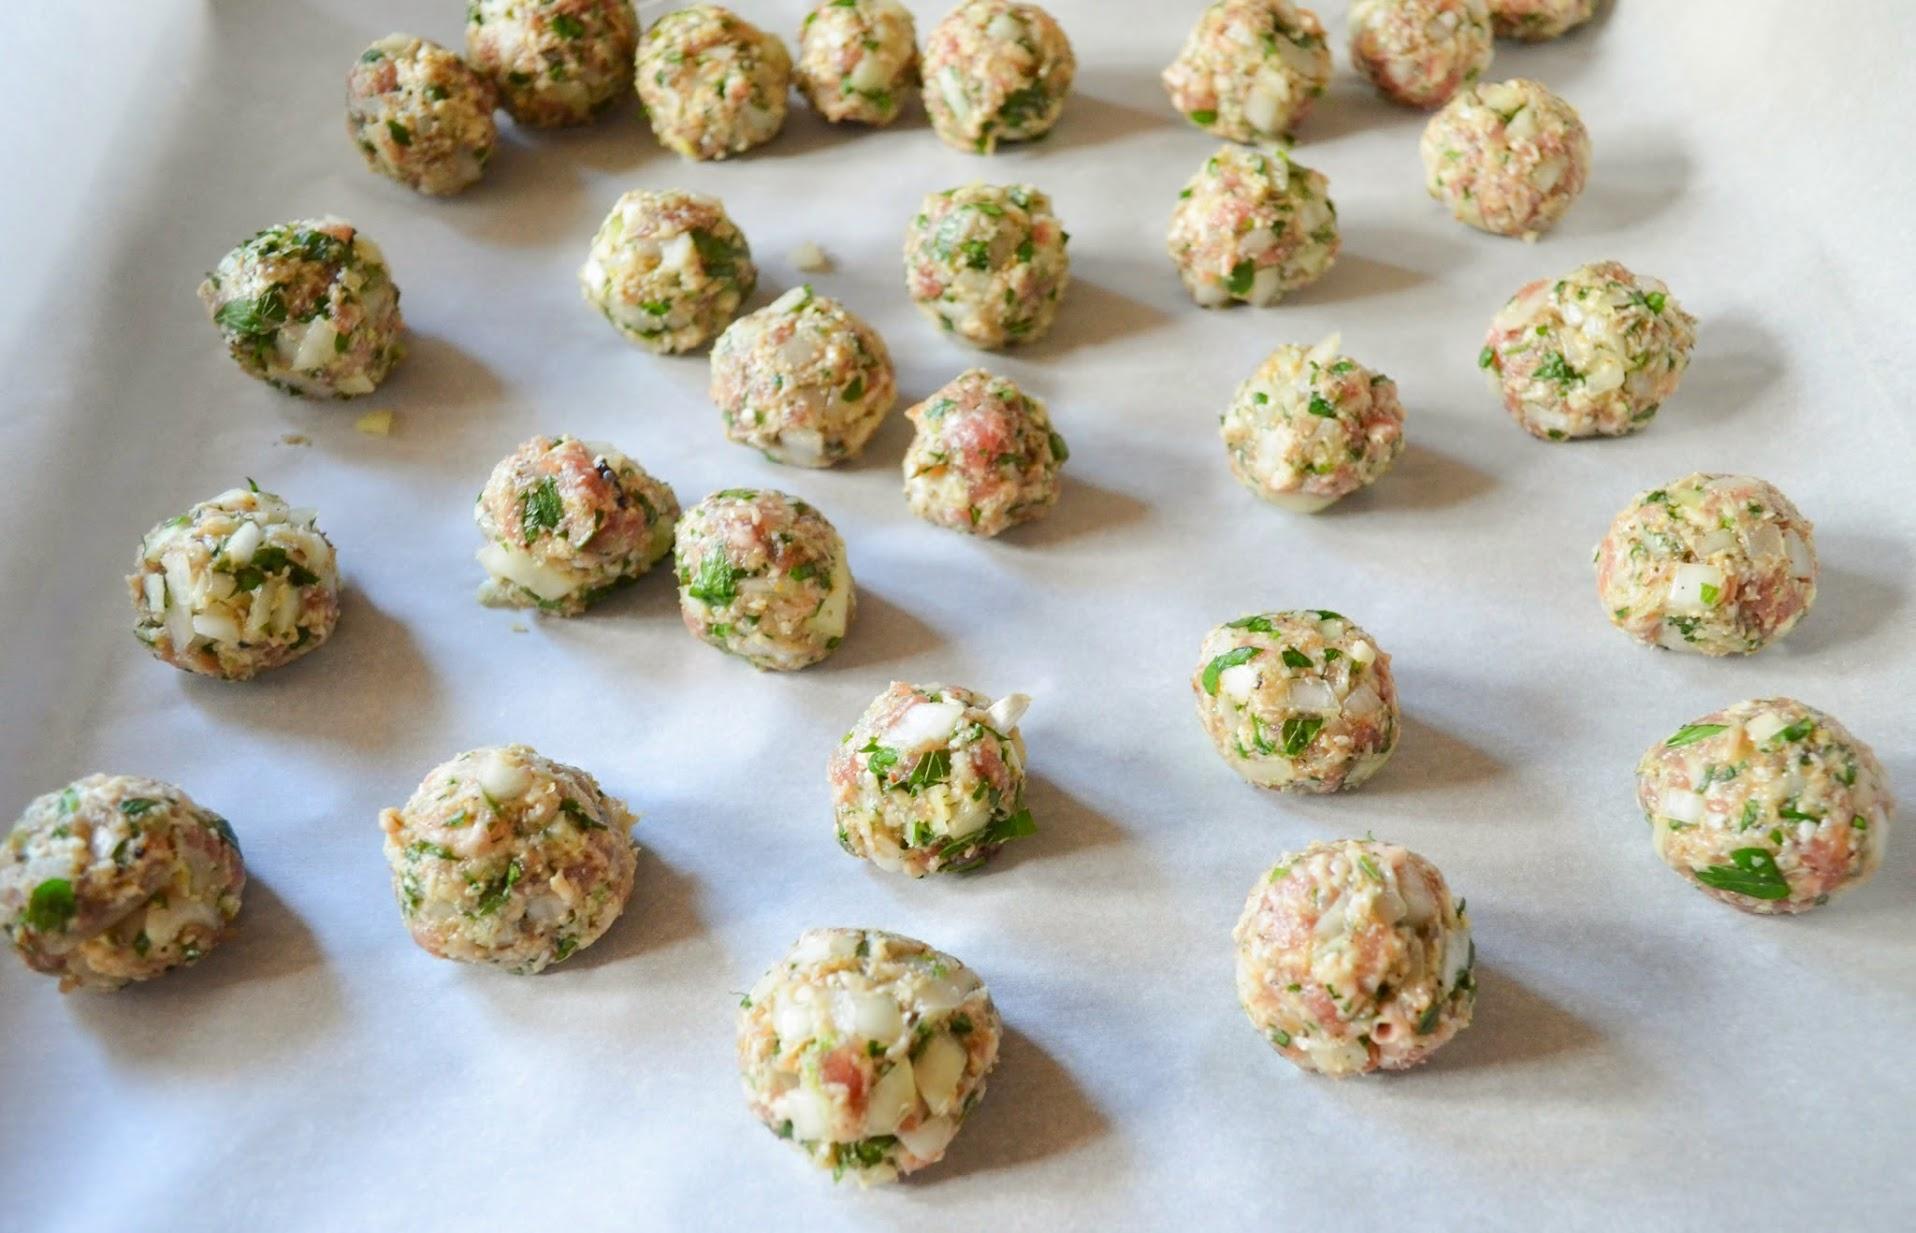 Italian-Wedding-Soup-With-Meatballs-Roll-Into-Meatballs.jpg